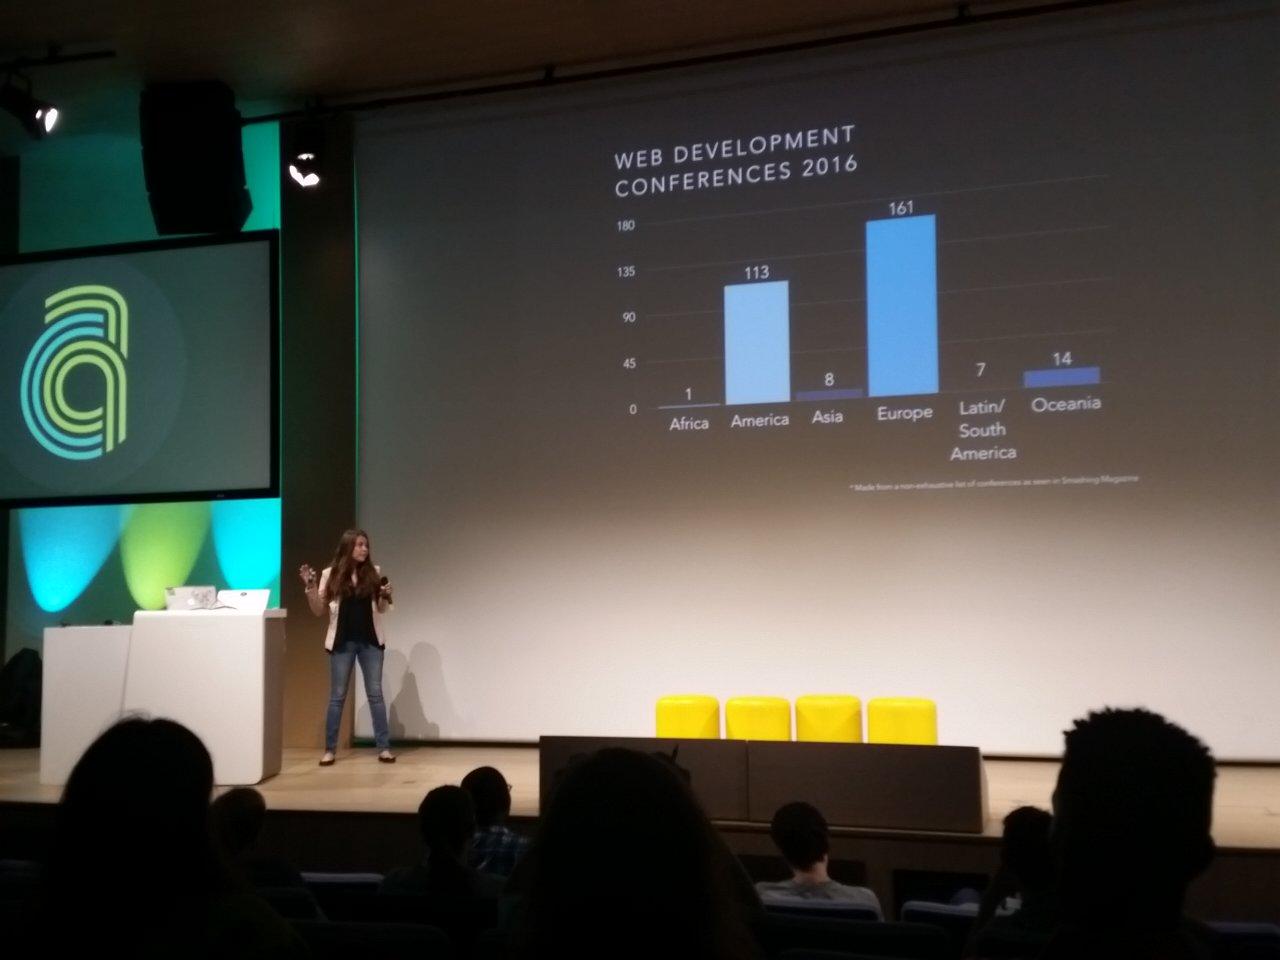 Web development conferences 2016 (statistics)